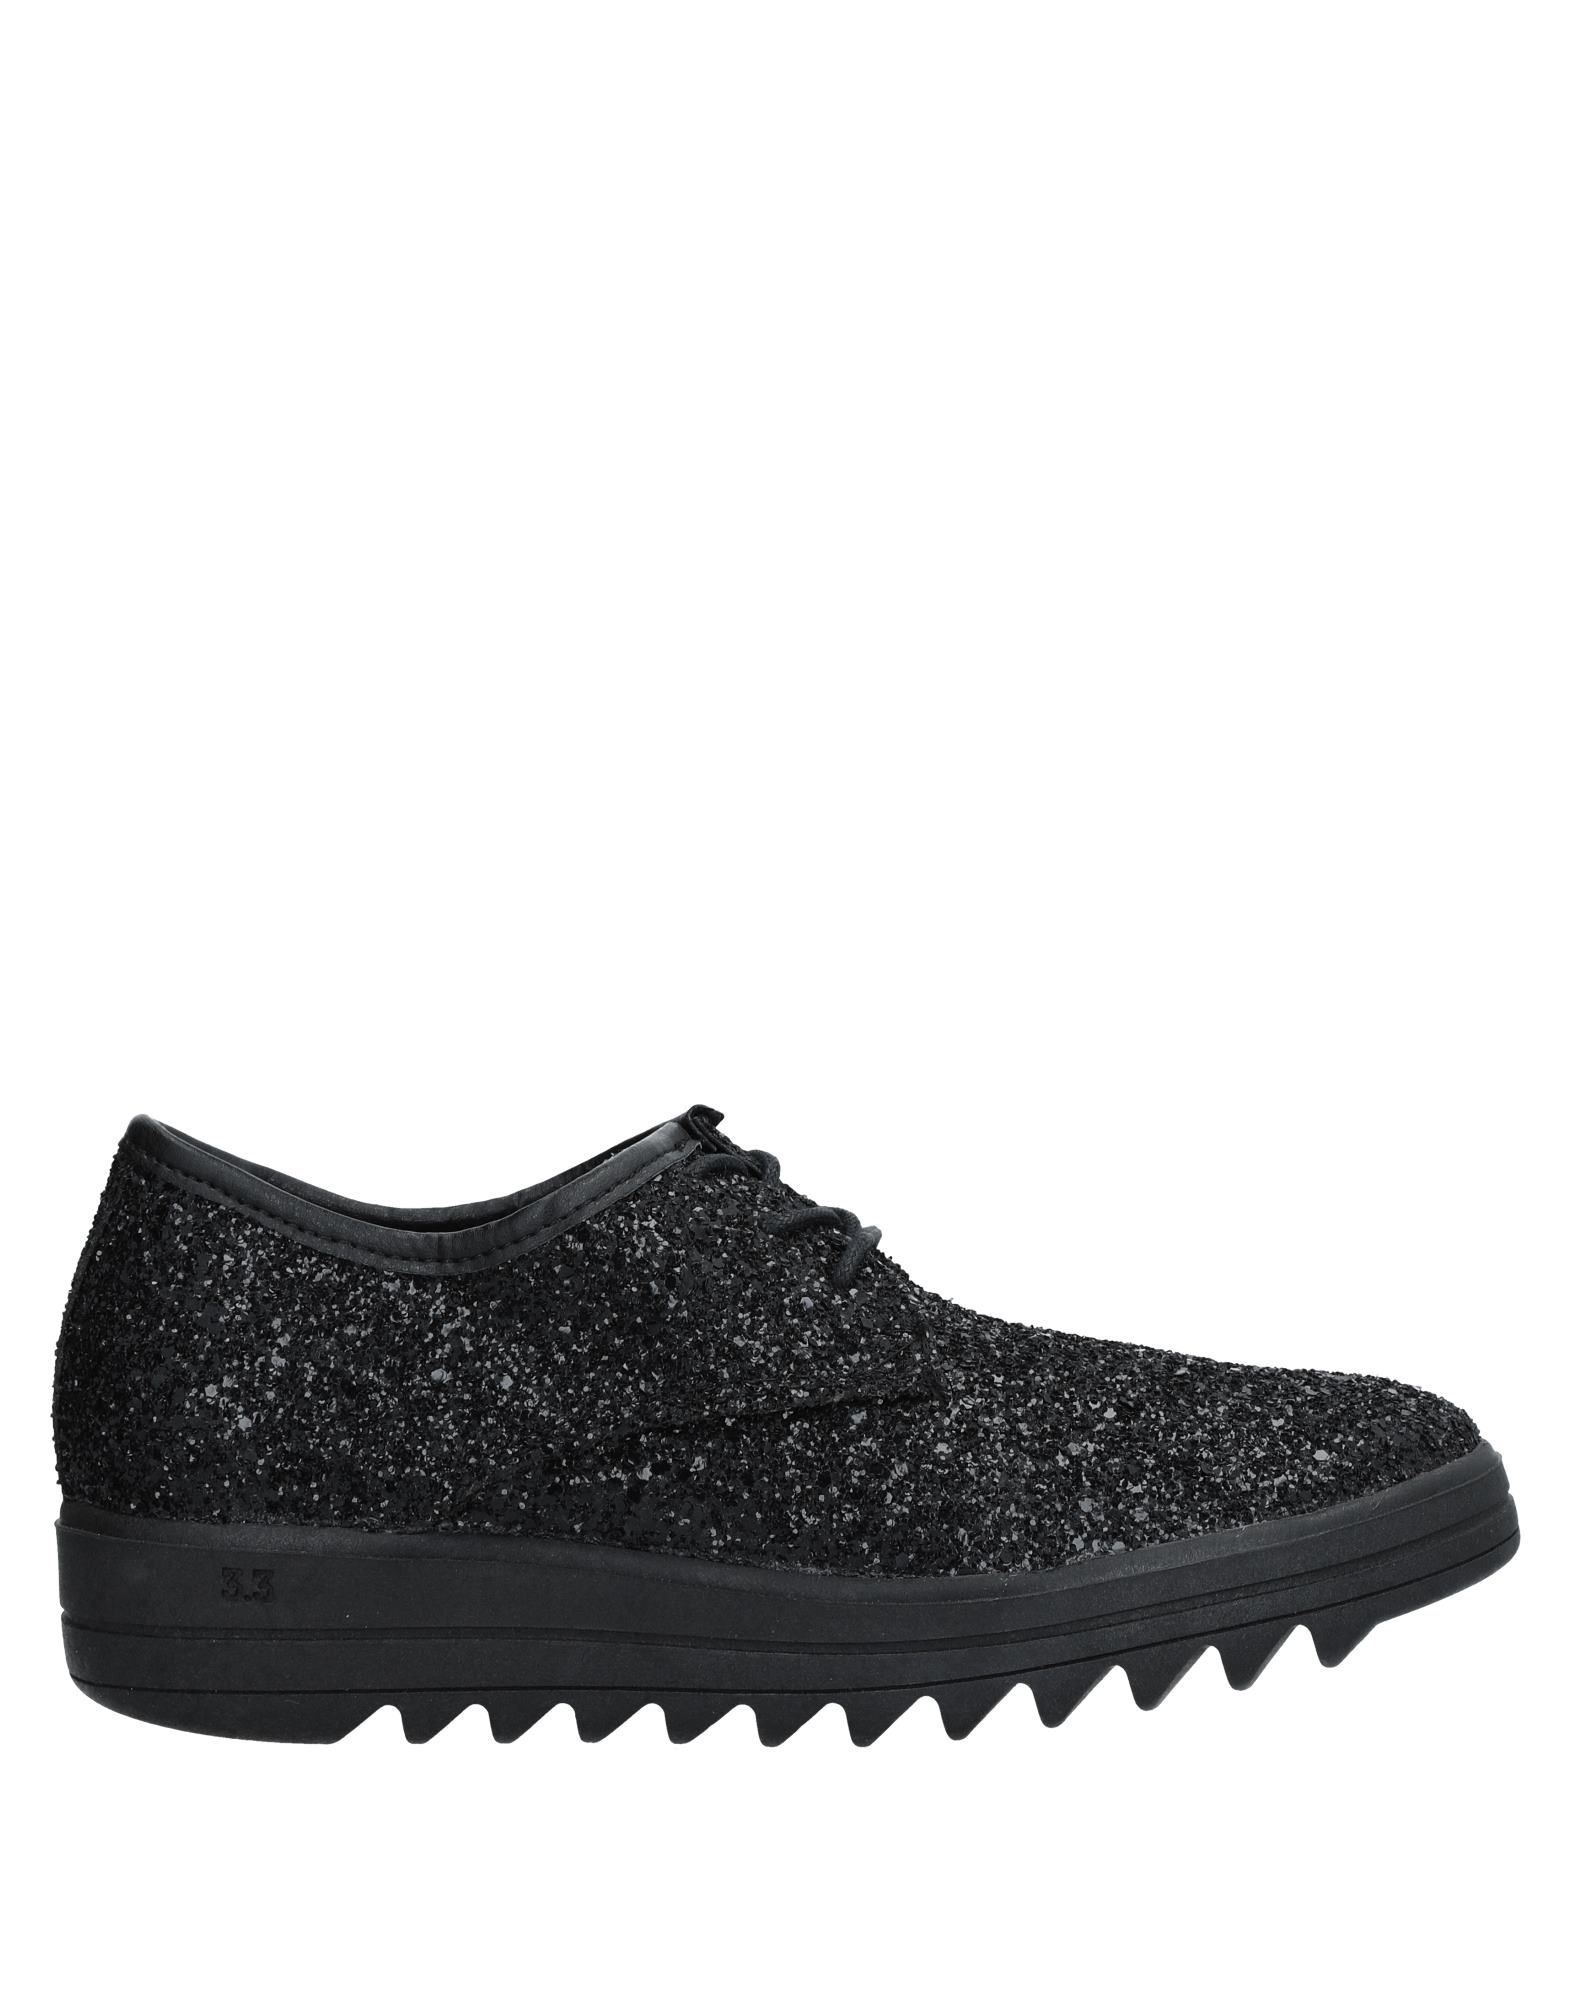 3.3 TREPUNTOTRE Обувь на шнурках repetto обувь на шнурках